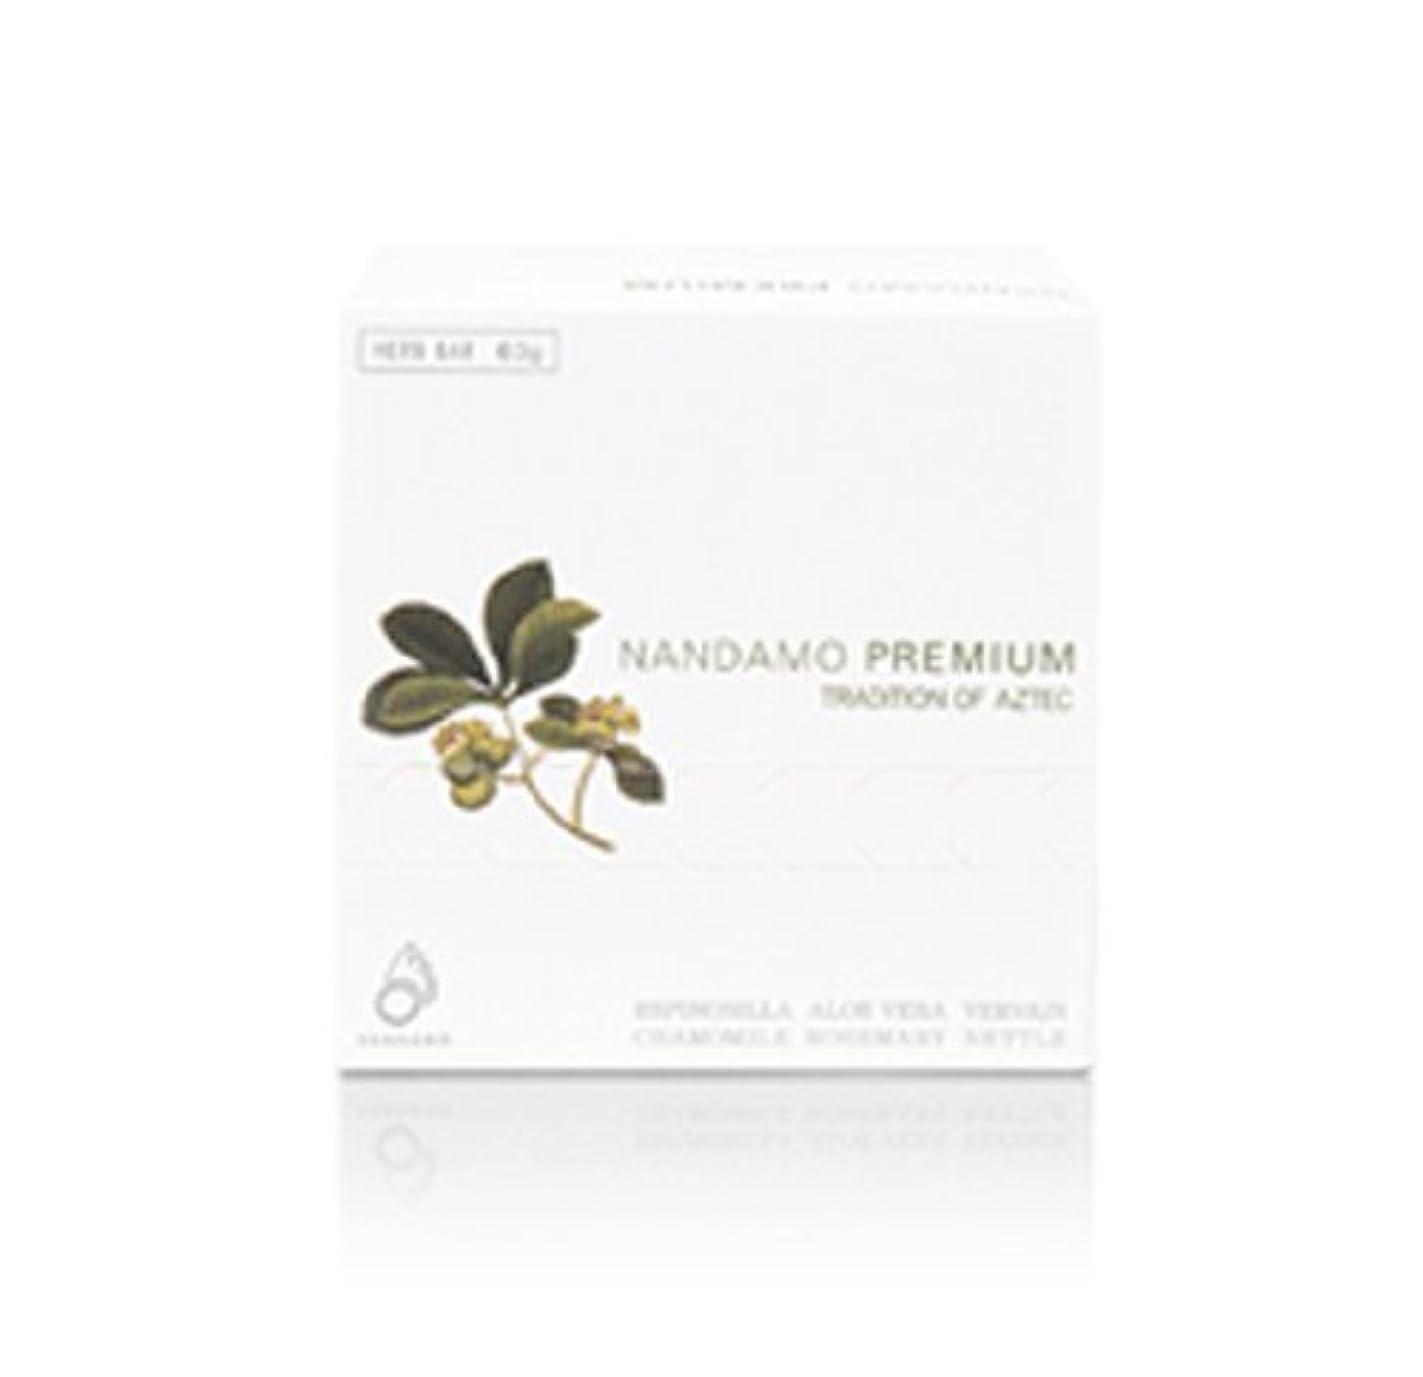 明日不透明な外出NANDAMO PREMIUM(ナンダモプレミアム)ナンダモプレミアム60g